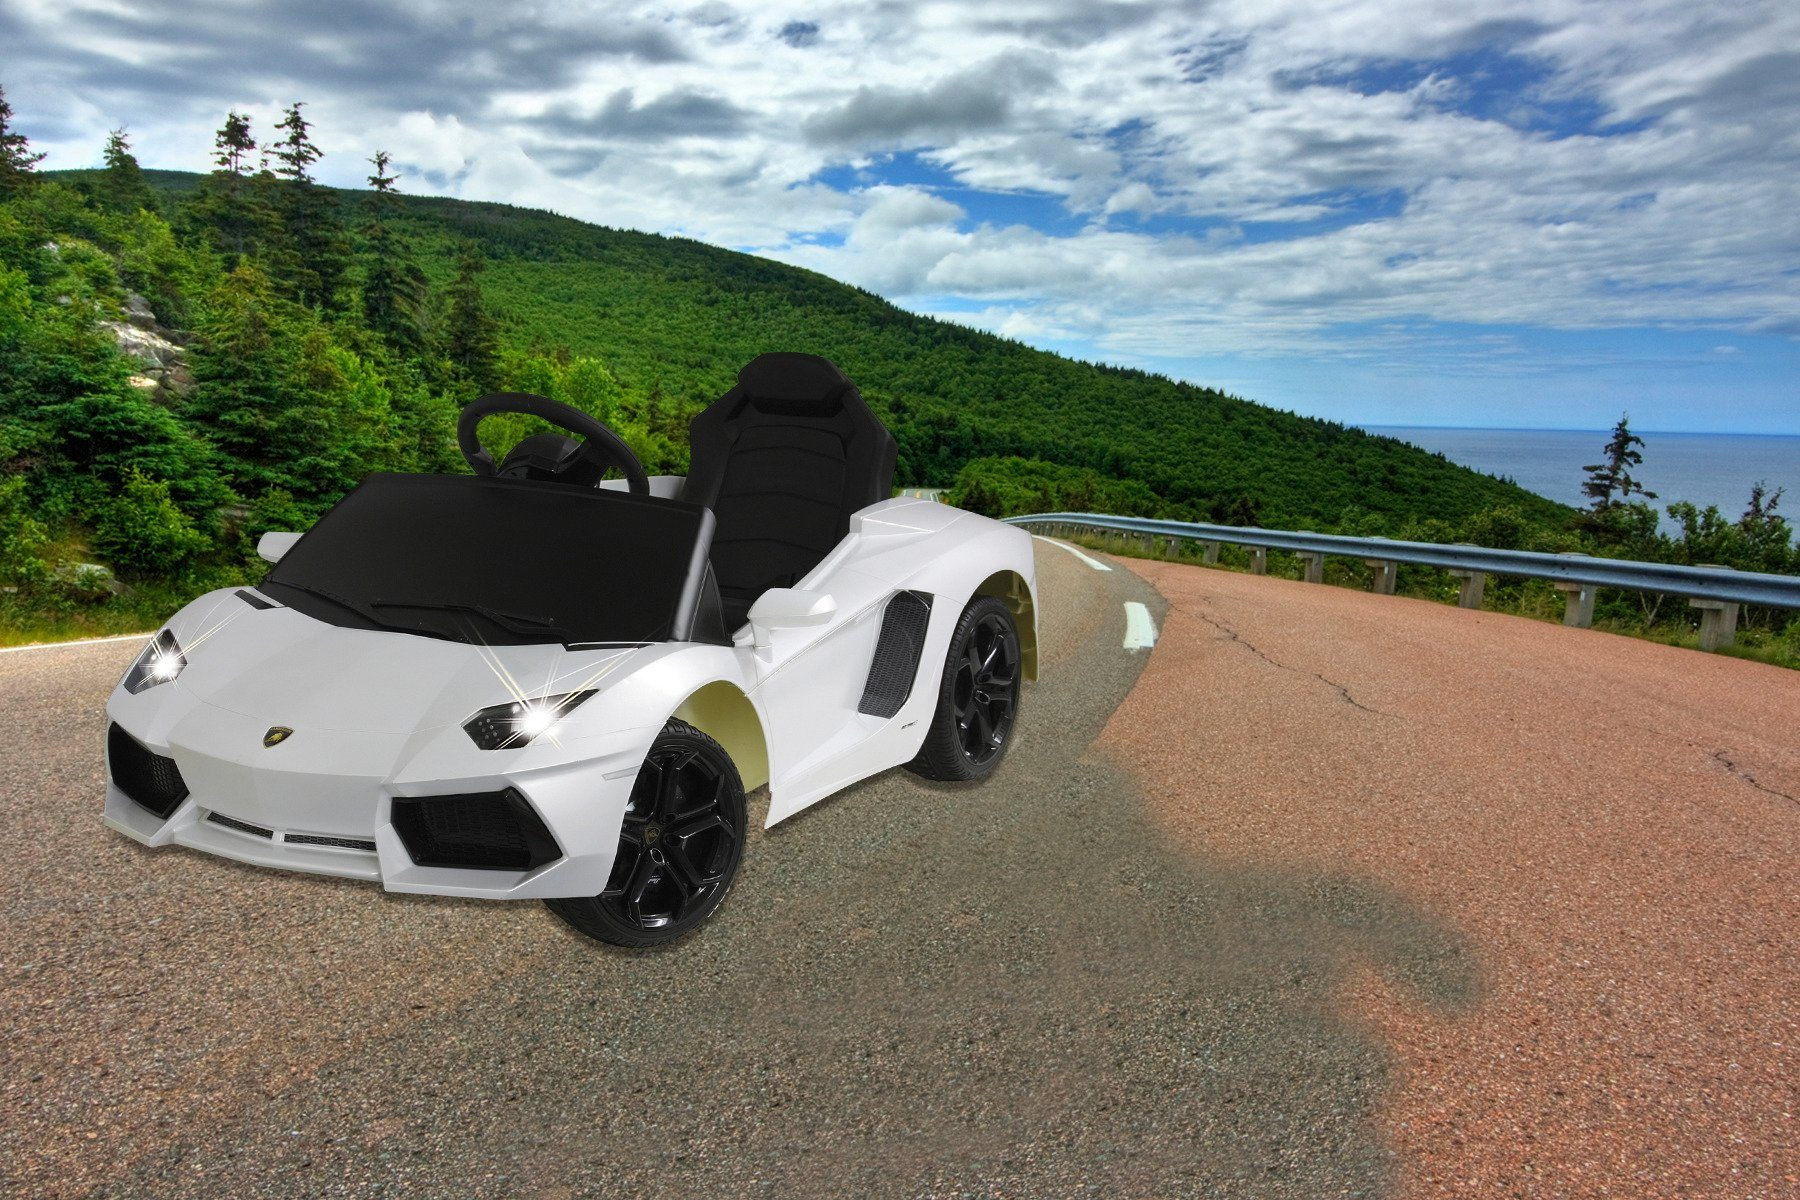 JAMARA KIDS Elektroauto »Ride-On Lamborghini Aventador«, weiß, inkl. Fernsteuerung